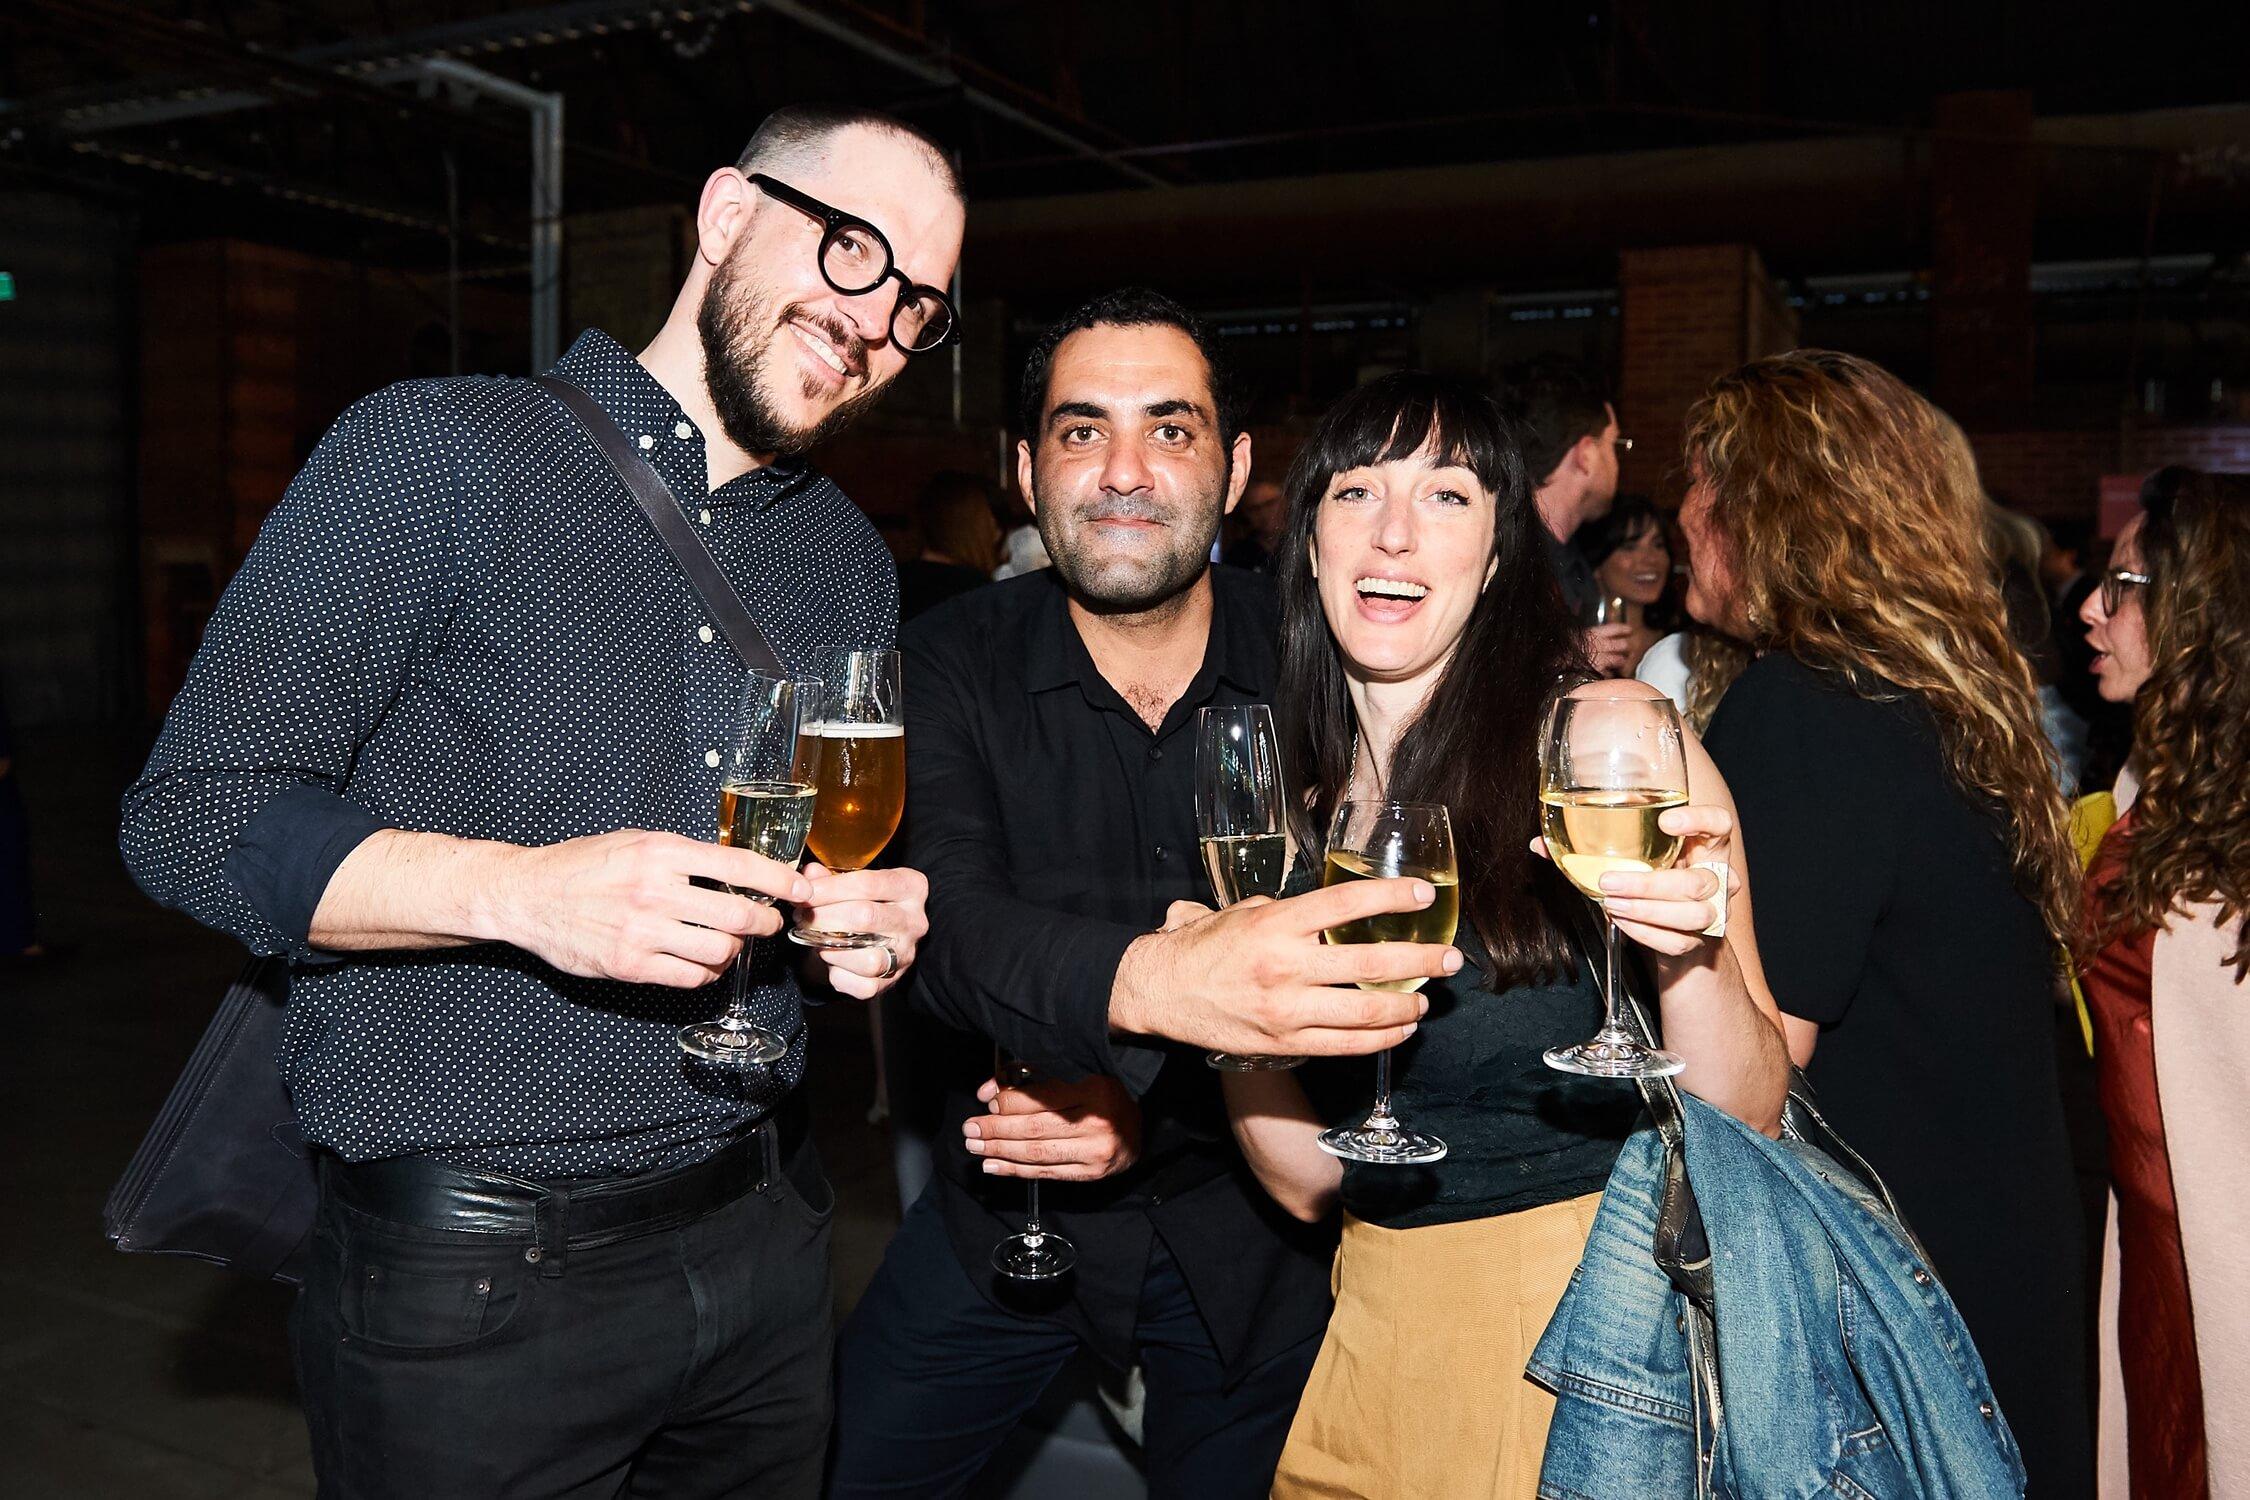 Superkul's Will Elsworthy, Pooya Baktash of Partisans and Lauren Abrahams of Public Work, AZ Awards 2019: Scenes from the Gala